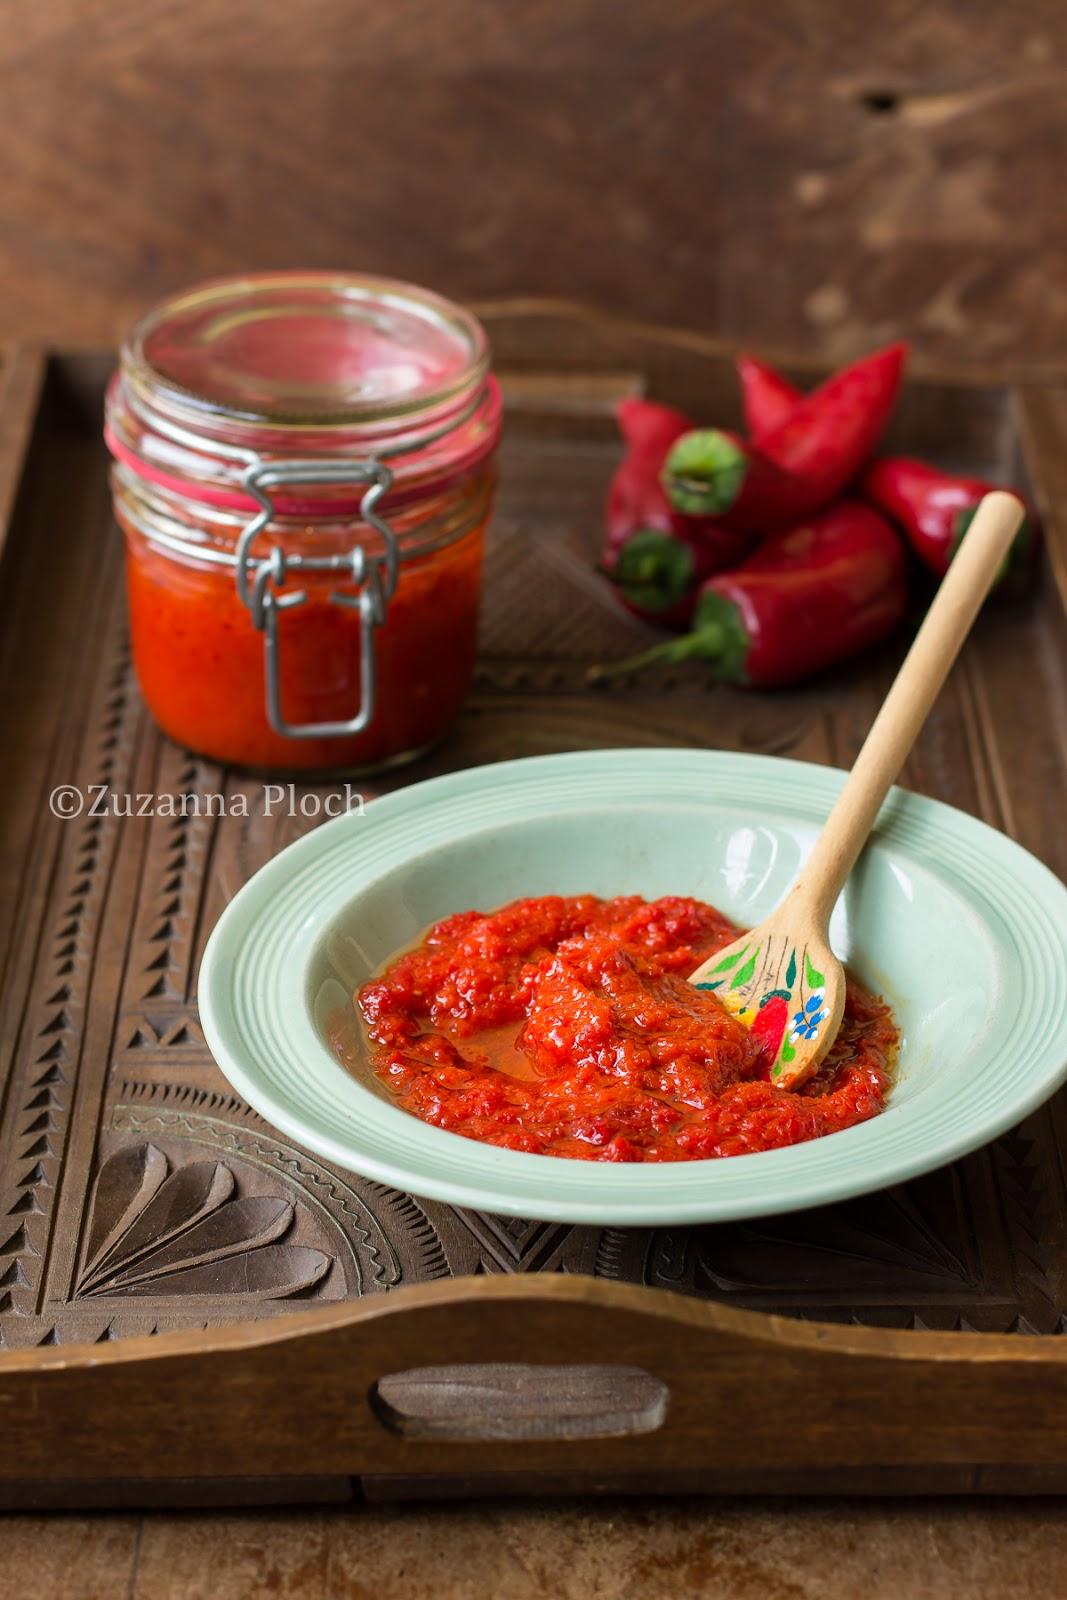 Turkish pepper paste - Food photography by Zuzanna Ploch, fotografia kulinarna